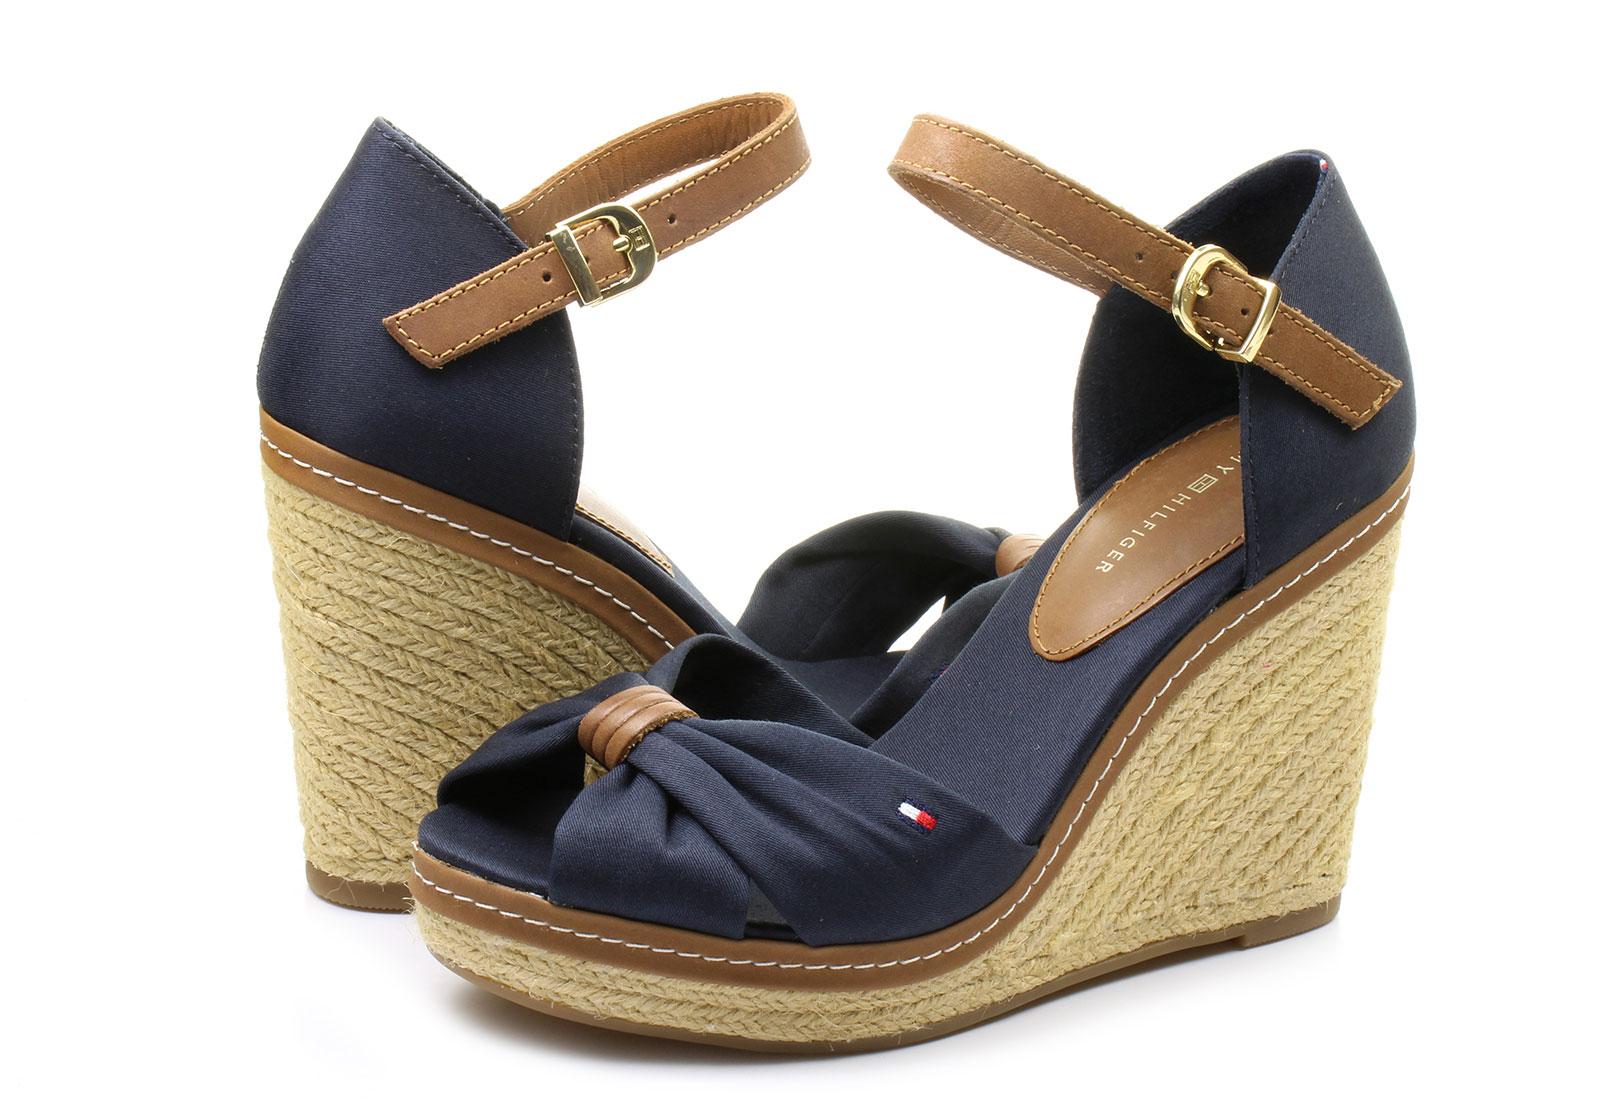 c9e1b6c3b7ae Tommy Hilfiger Sandals - Elena 1d - 16S-0644-403 - Online shop for ...